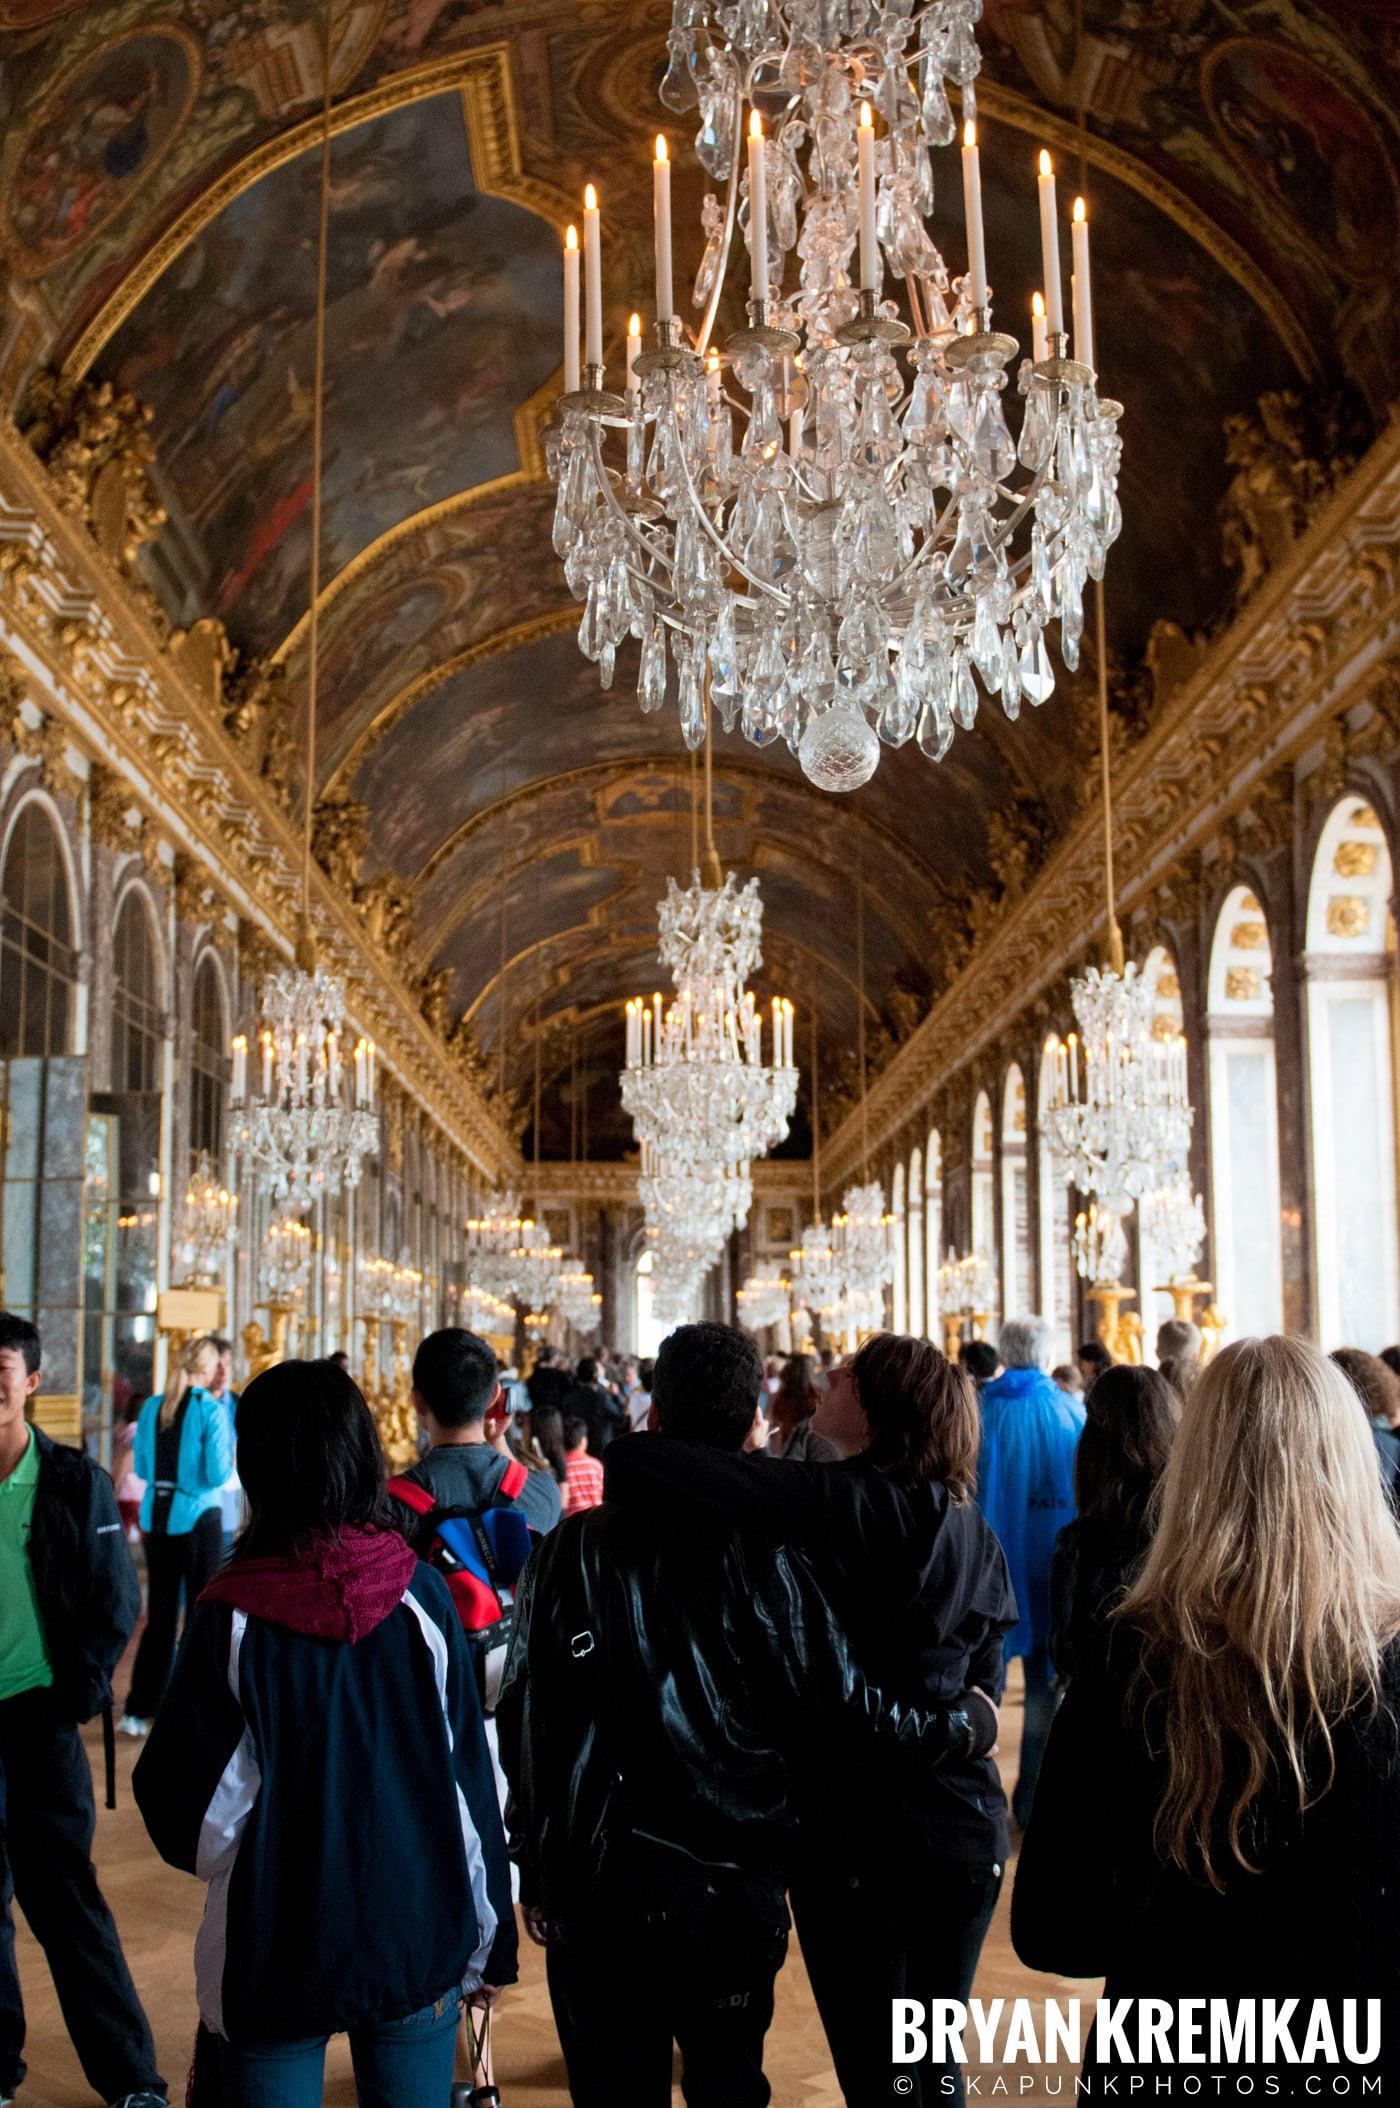 Paris, France Honeymoon - Day 2 - 7.19.11 (32)